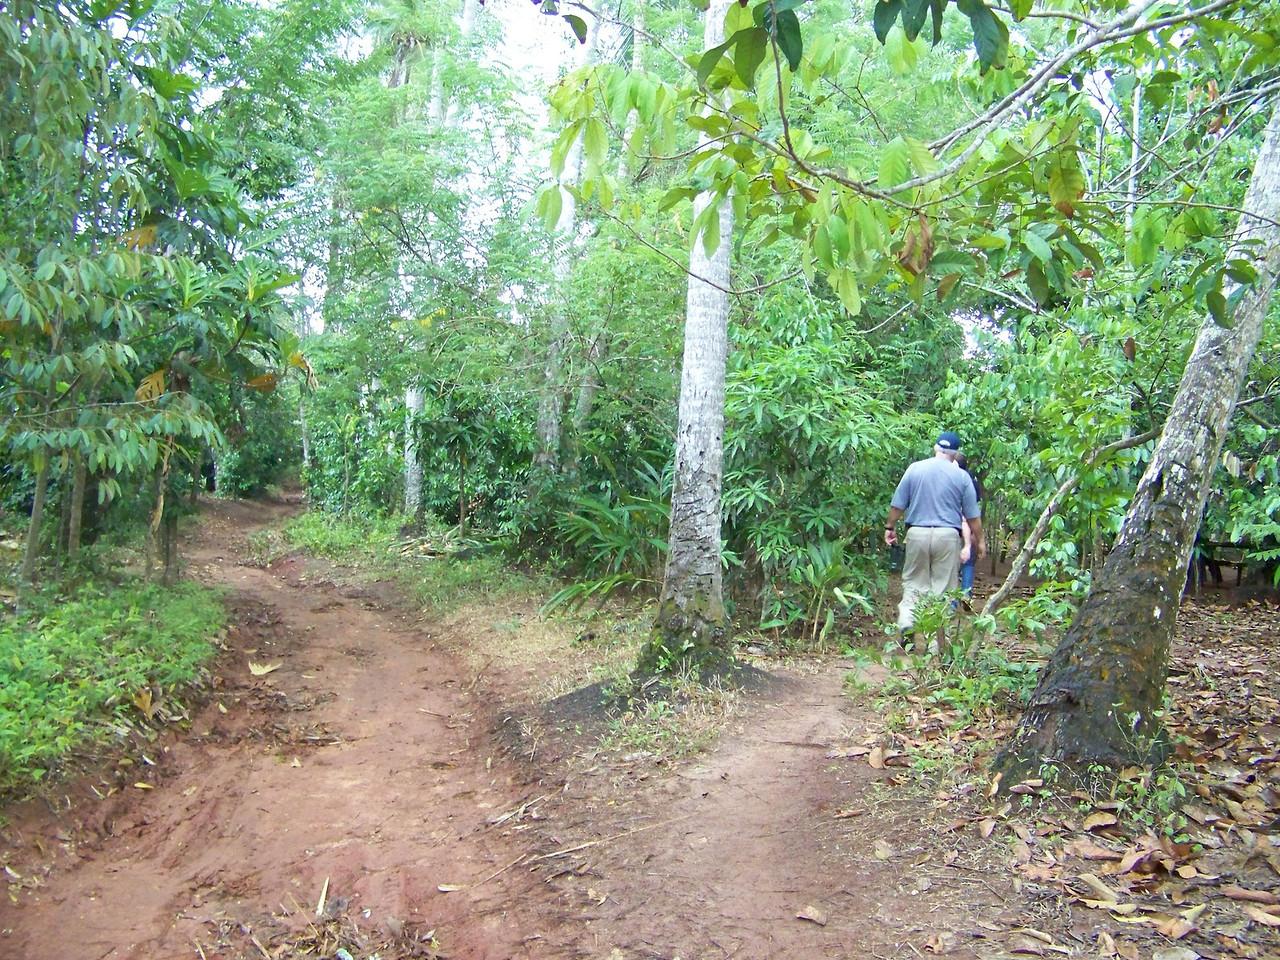 1004 - Tour of Spice Plantation - Zanzibar - Tanzania.JPG